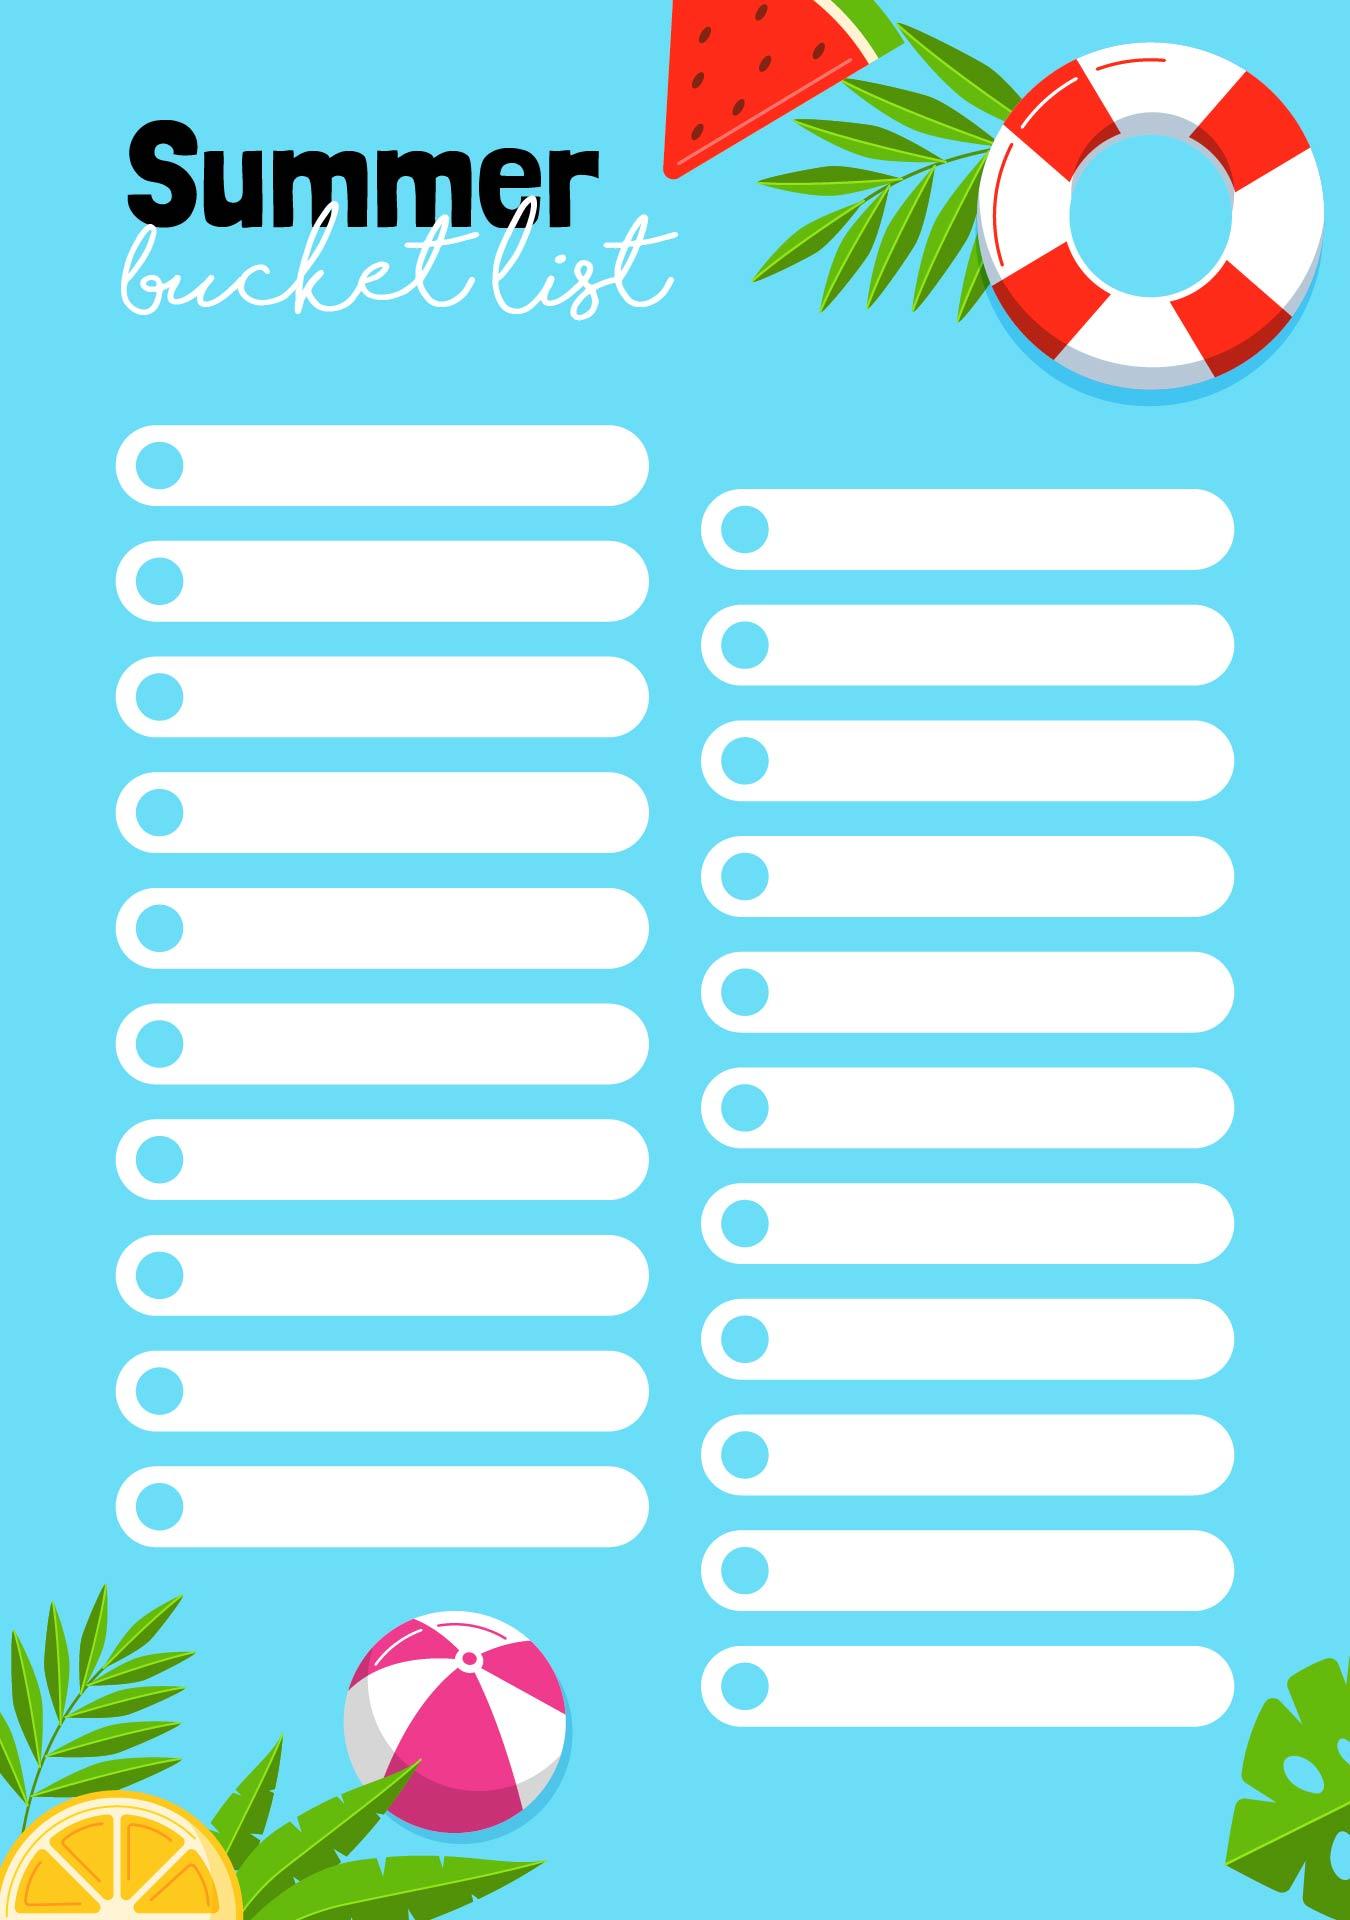 Summer Bucket List Template Printable